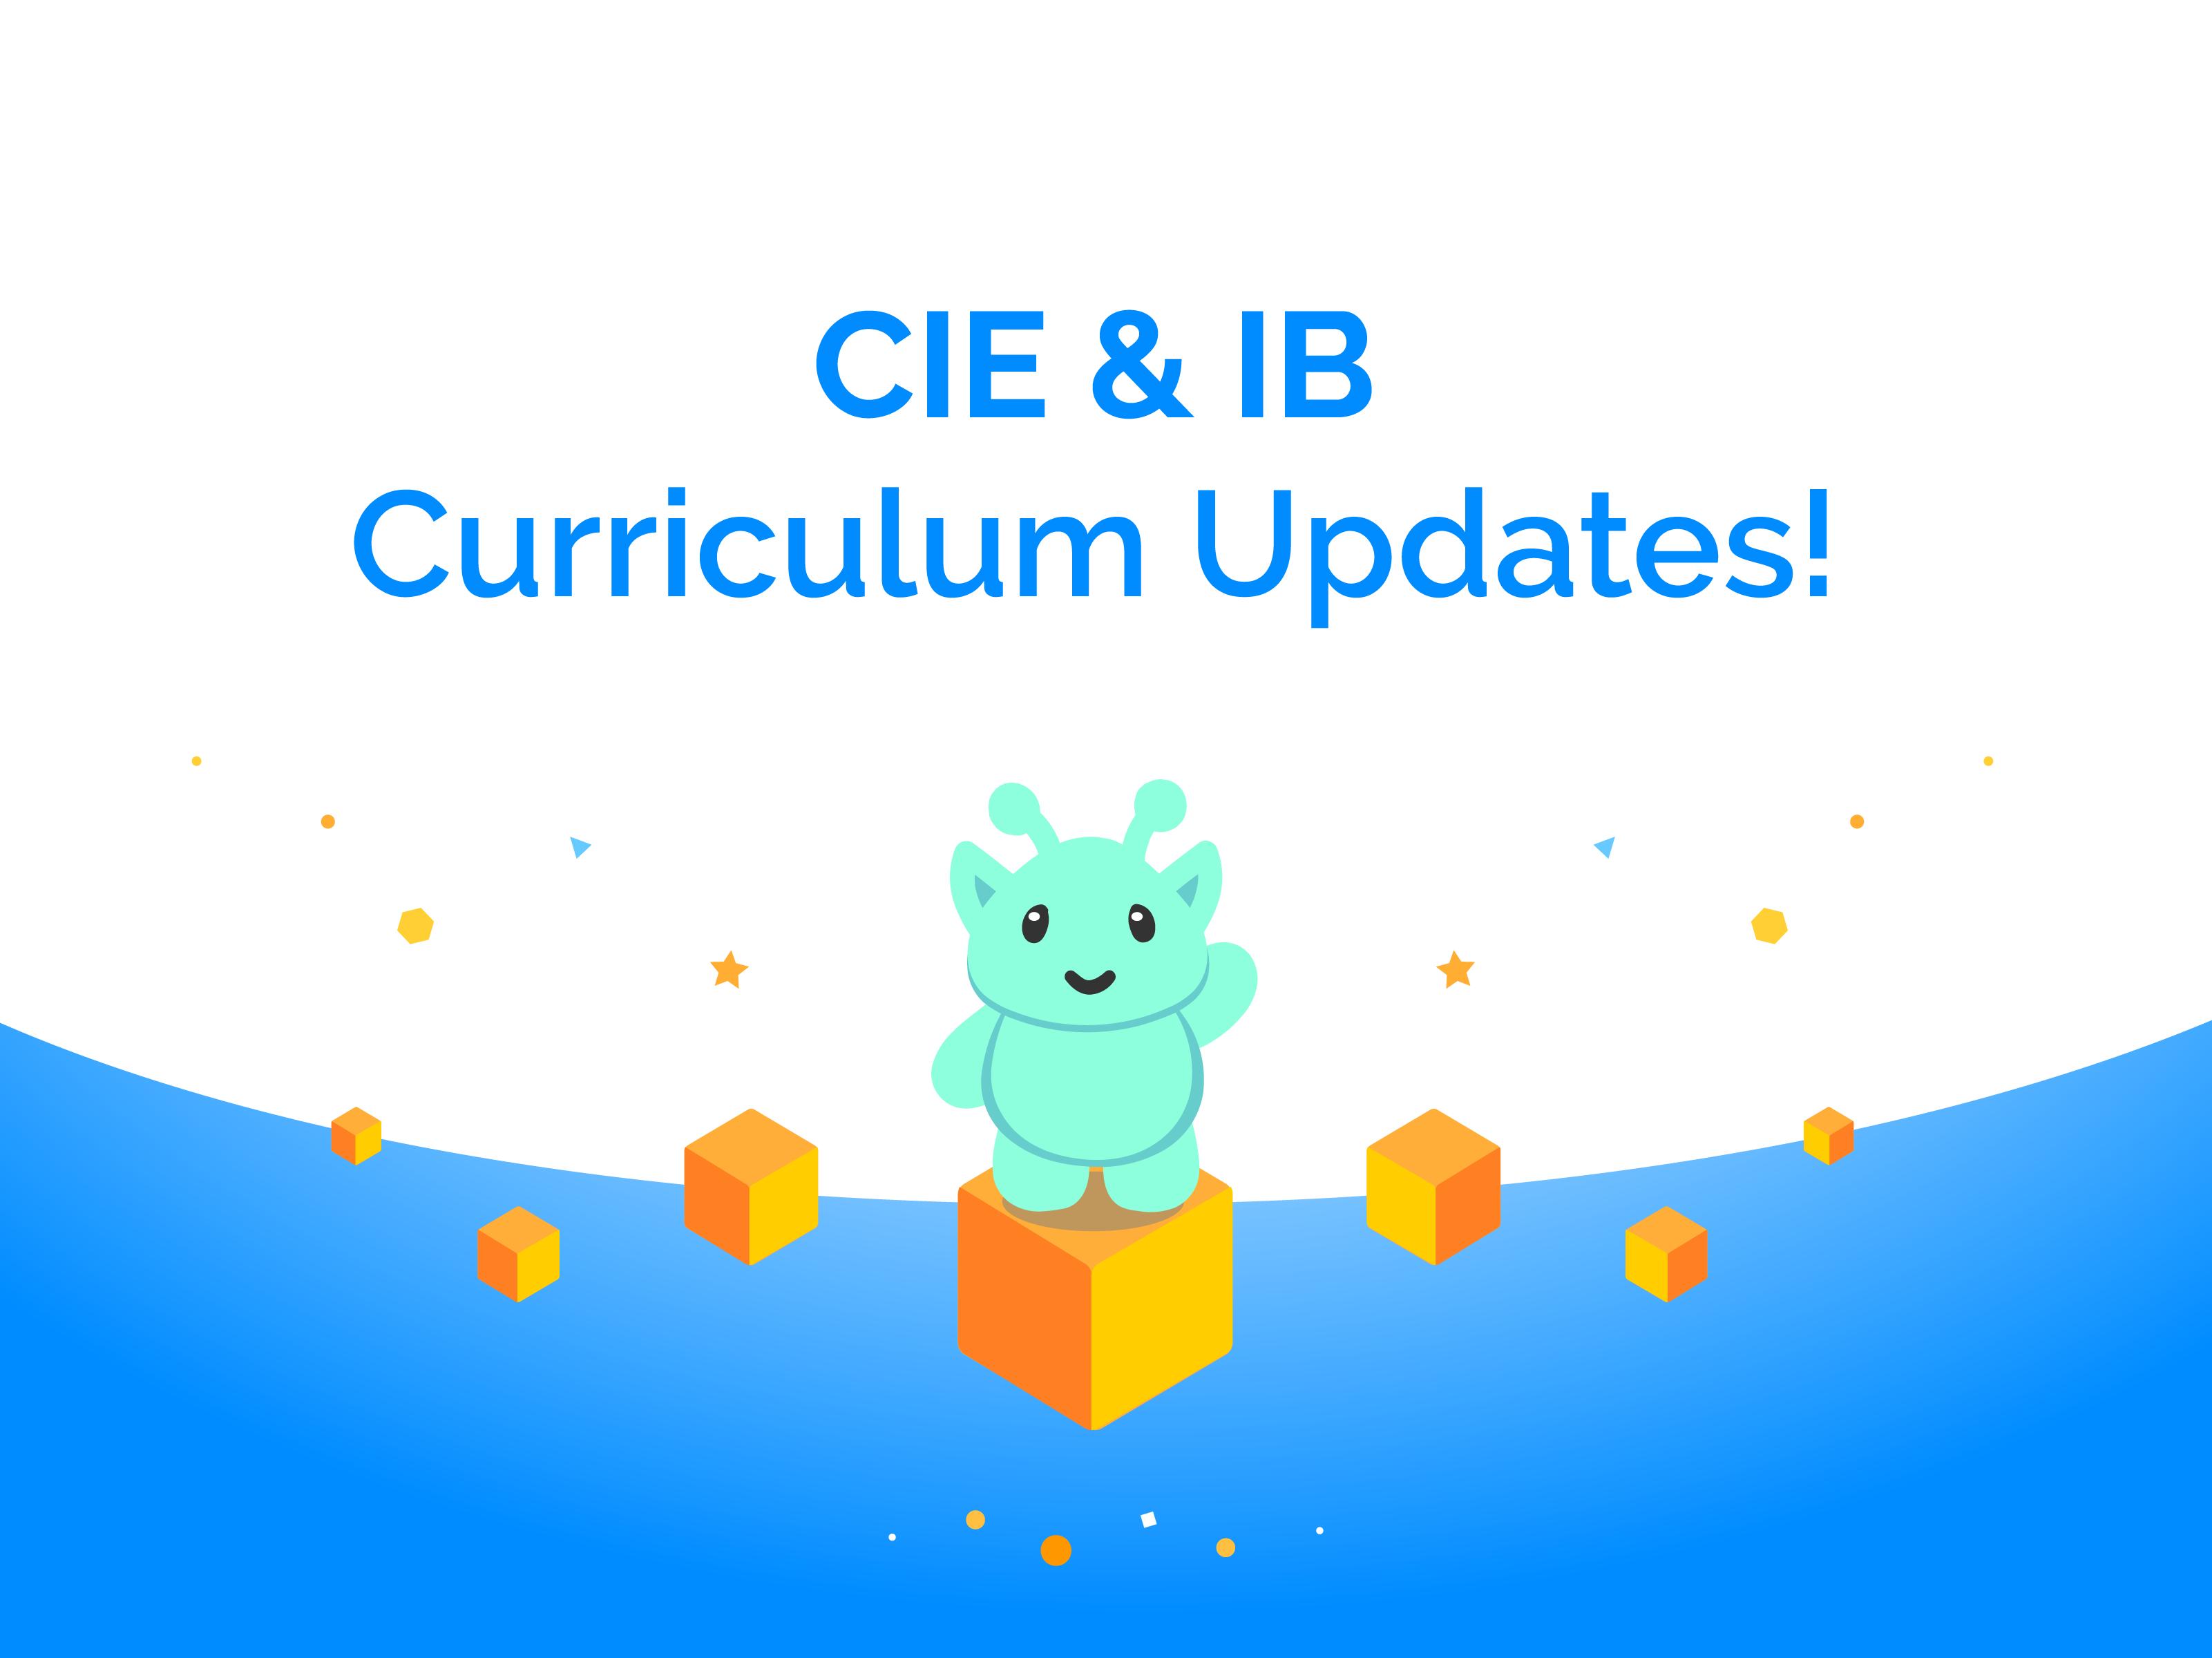 CIE and IB Curriculum Updates on Mangahigh